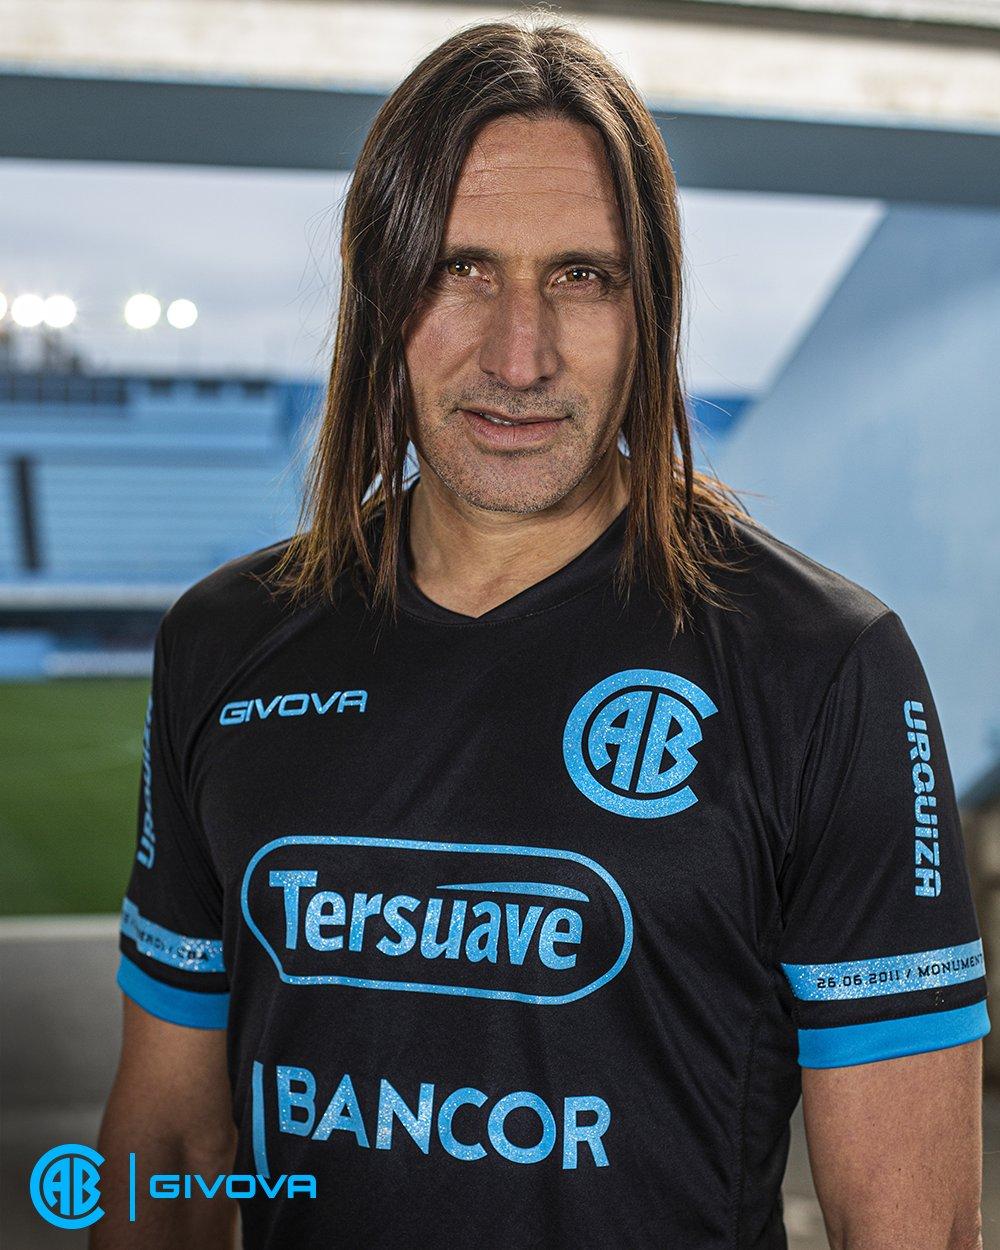 Terceira camisa do CA Belgrano 2021 Givova